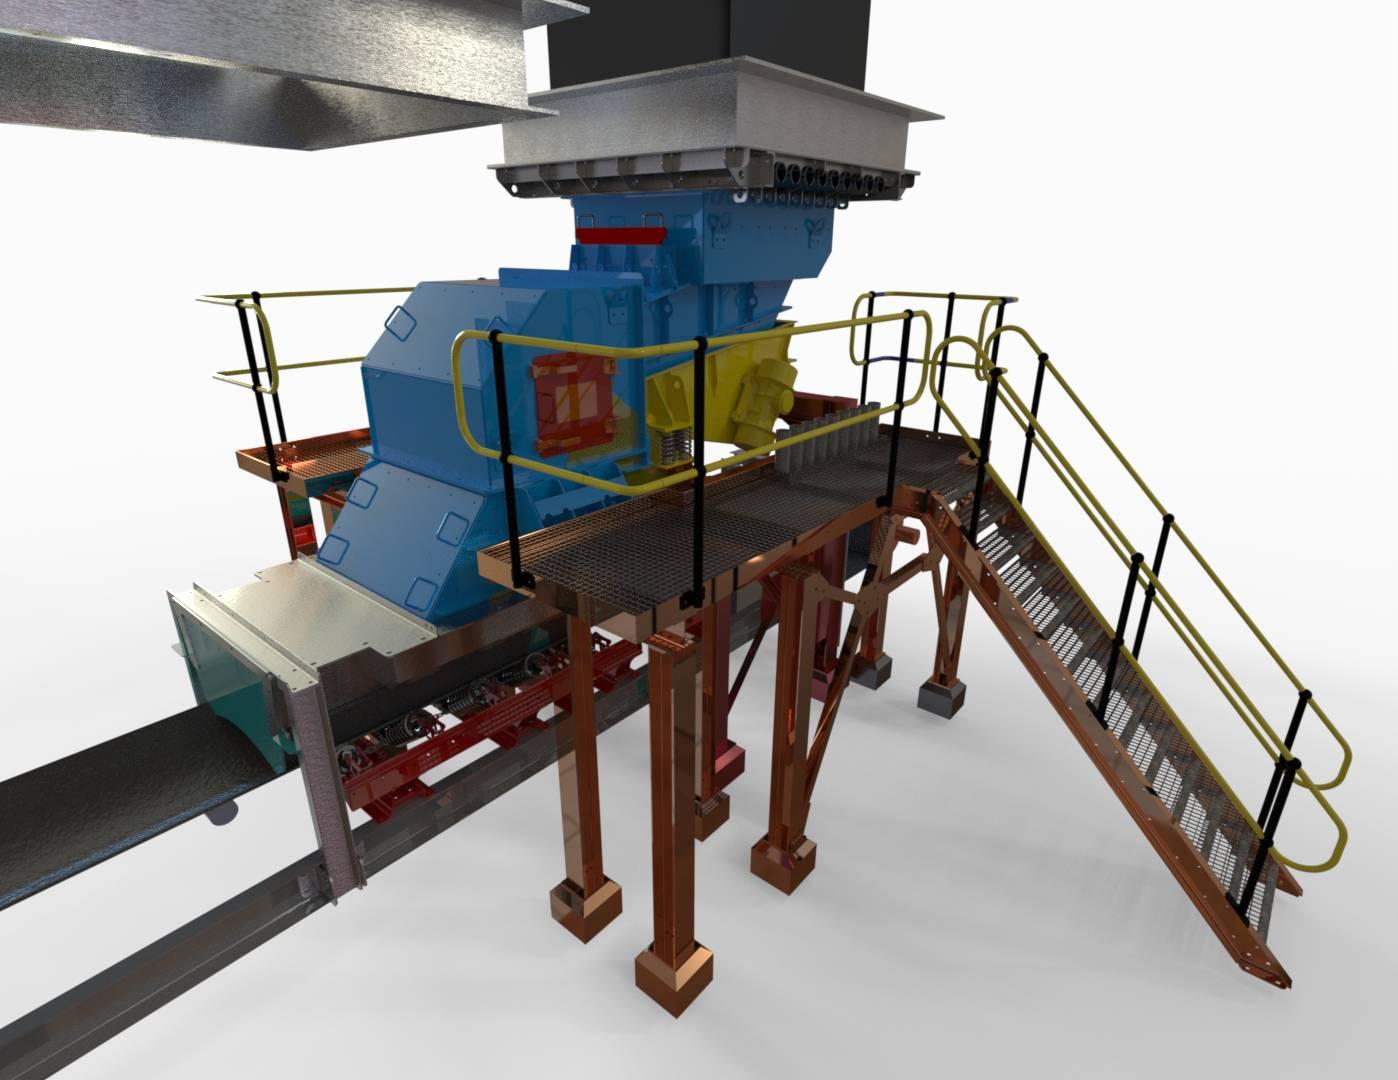 Weba Chutes To Optimise Silo Ore Flow For Sa Gold Mine